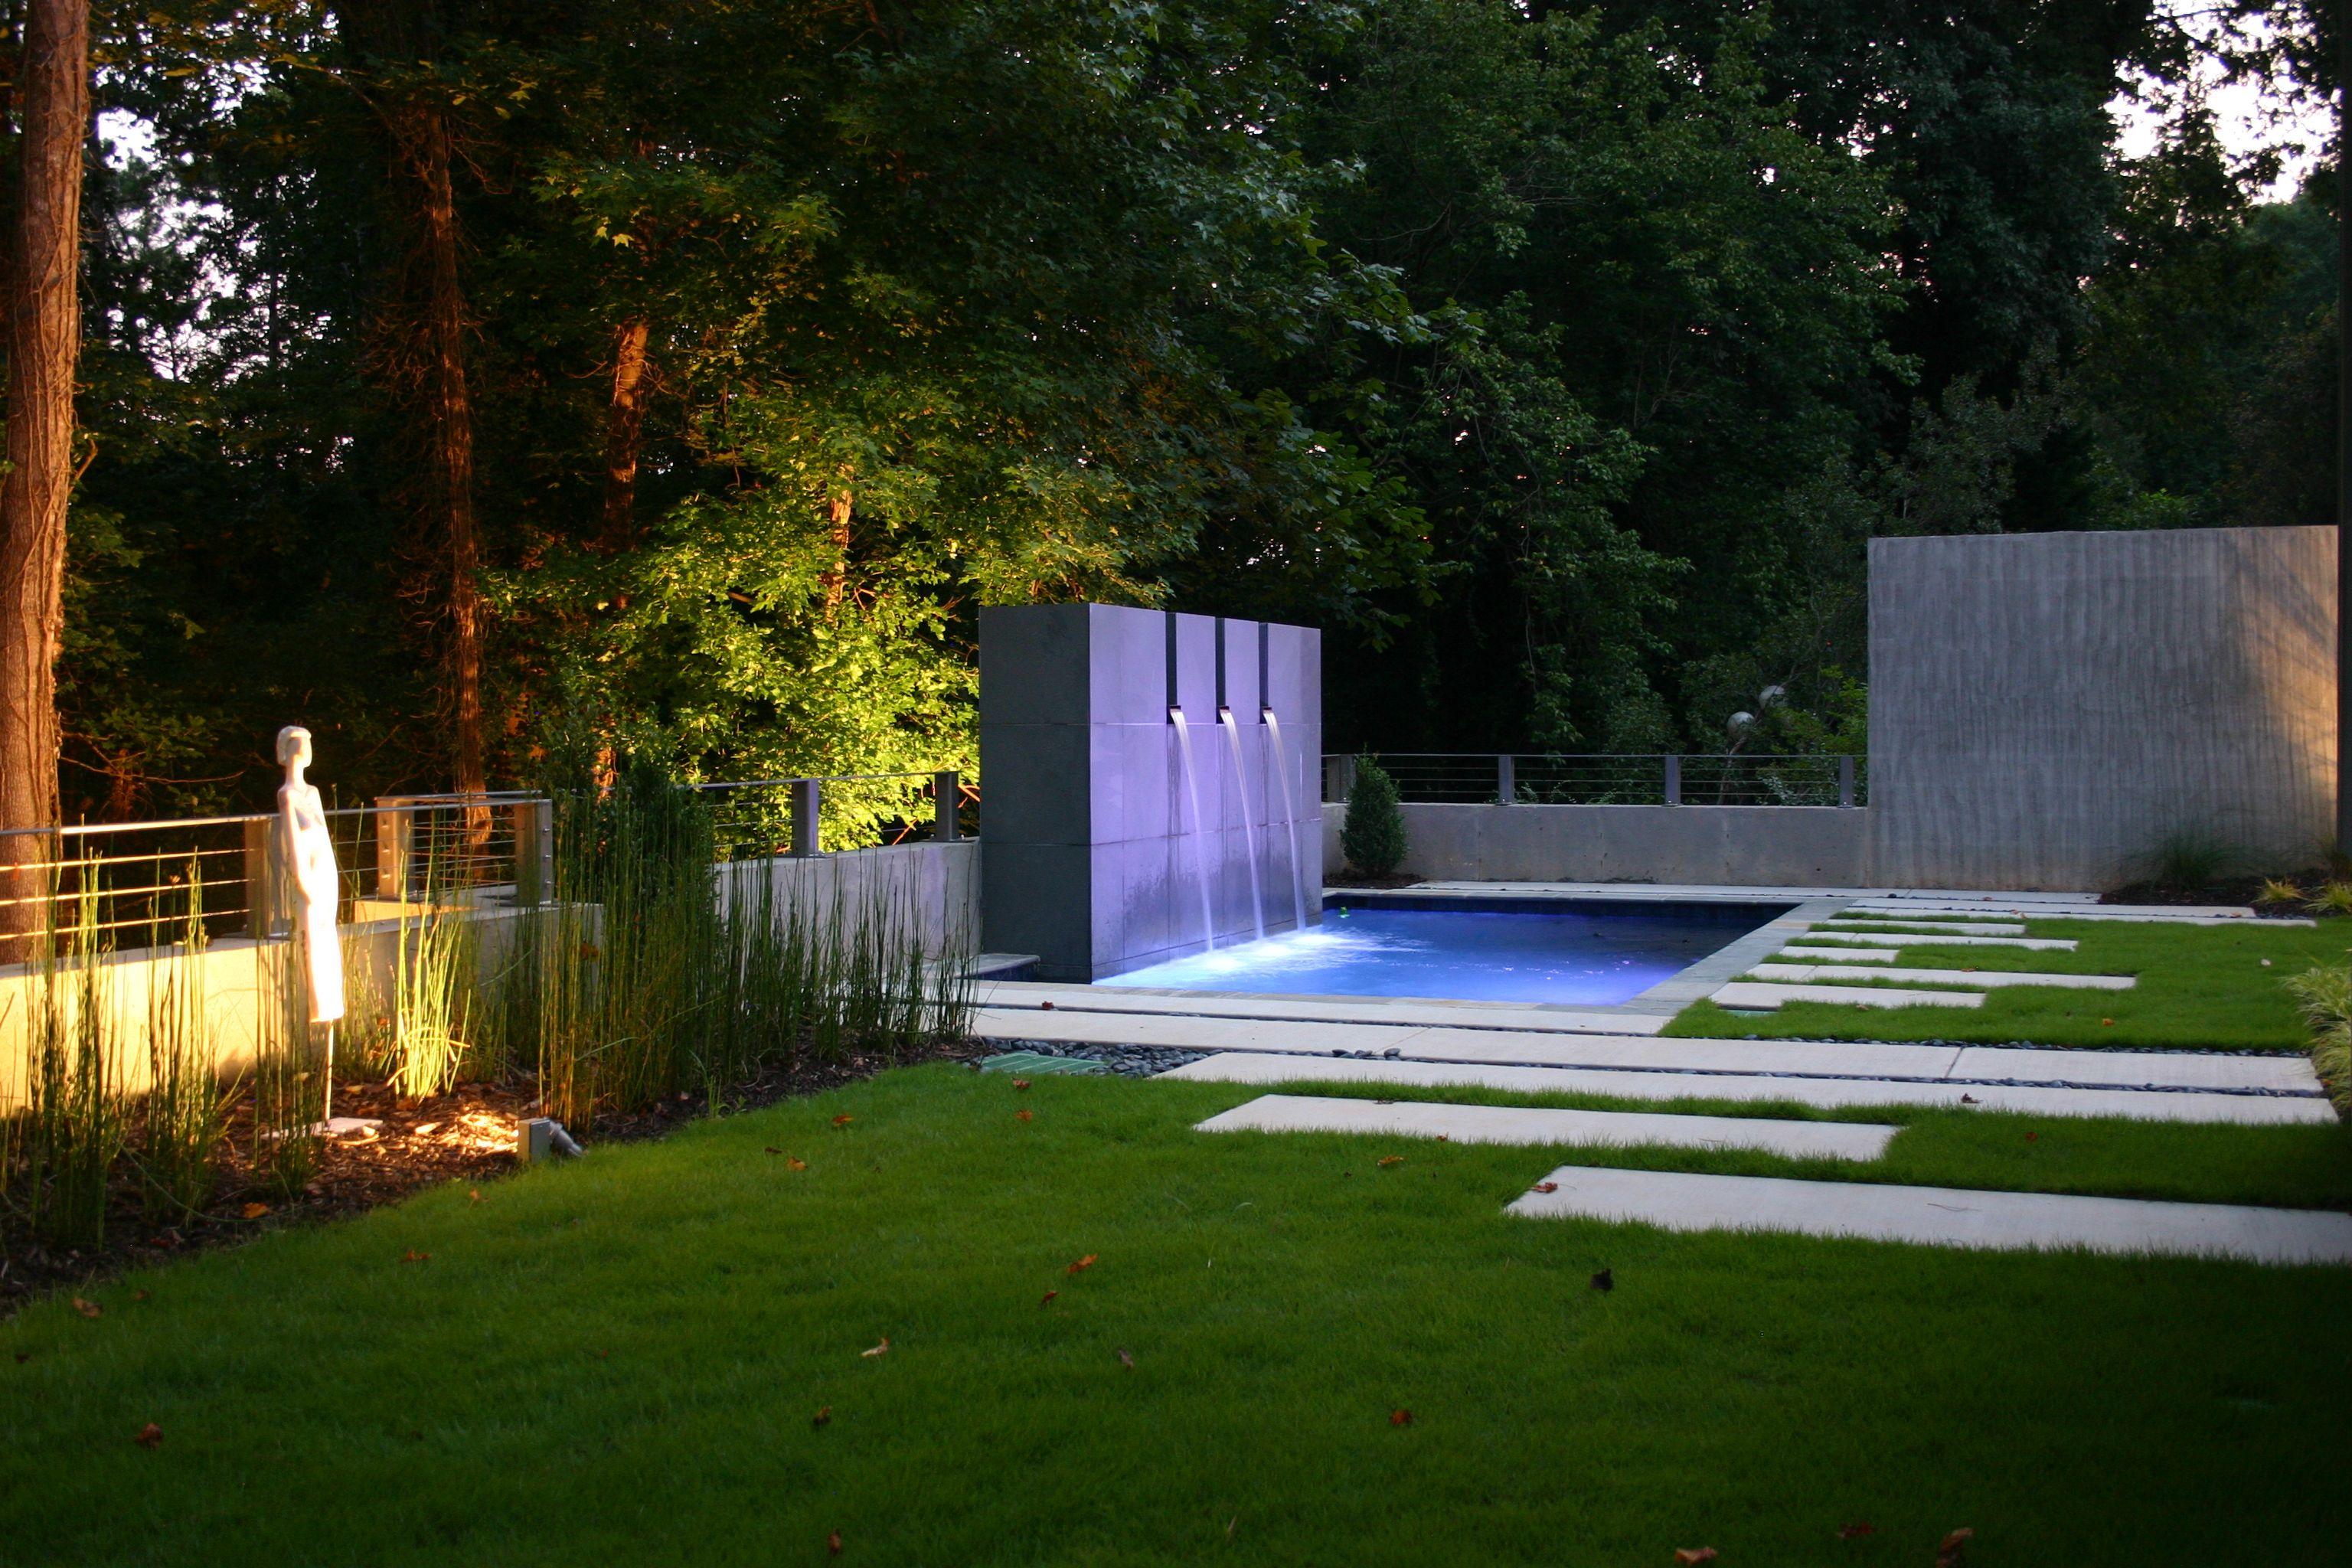 metro atlanta home with a modern backyard swimming pool design